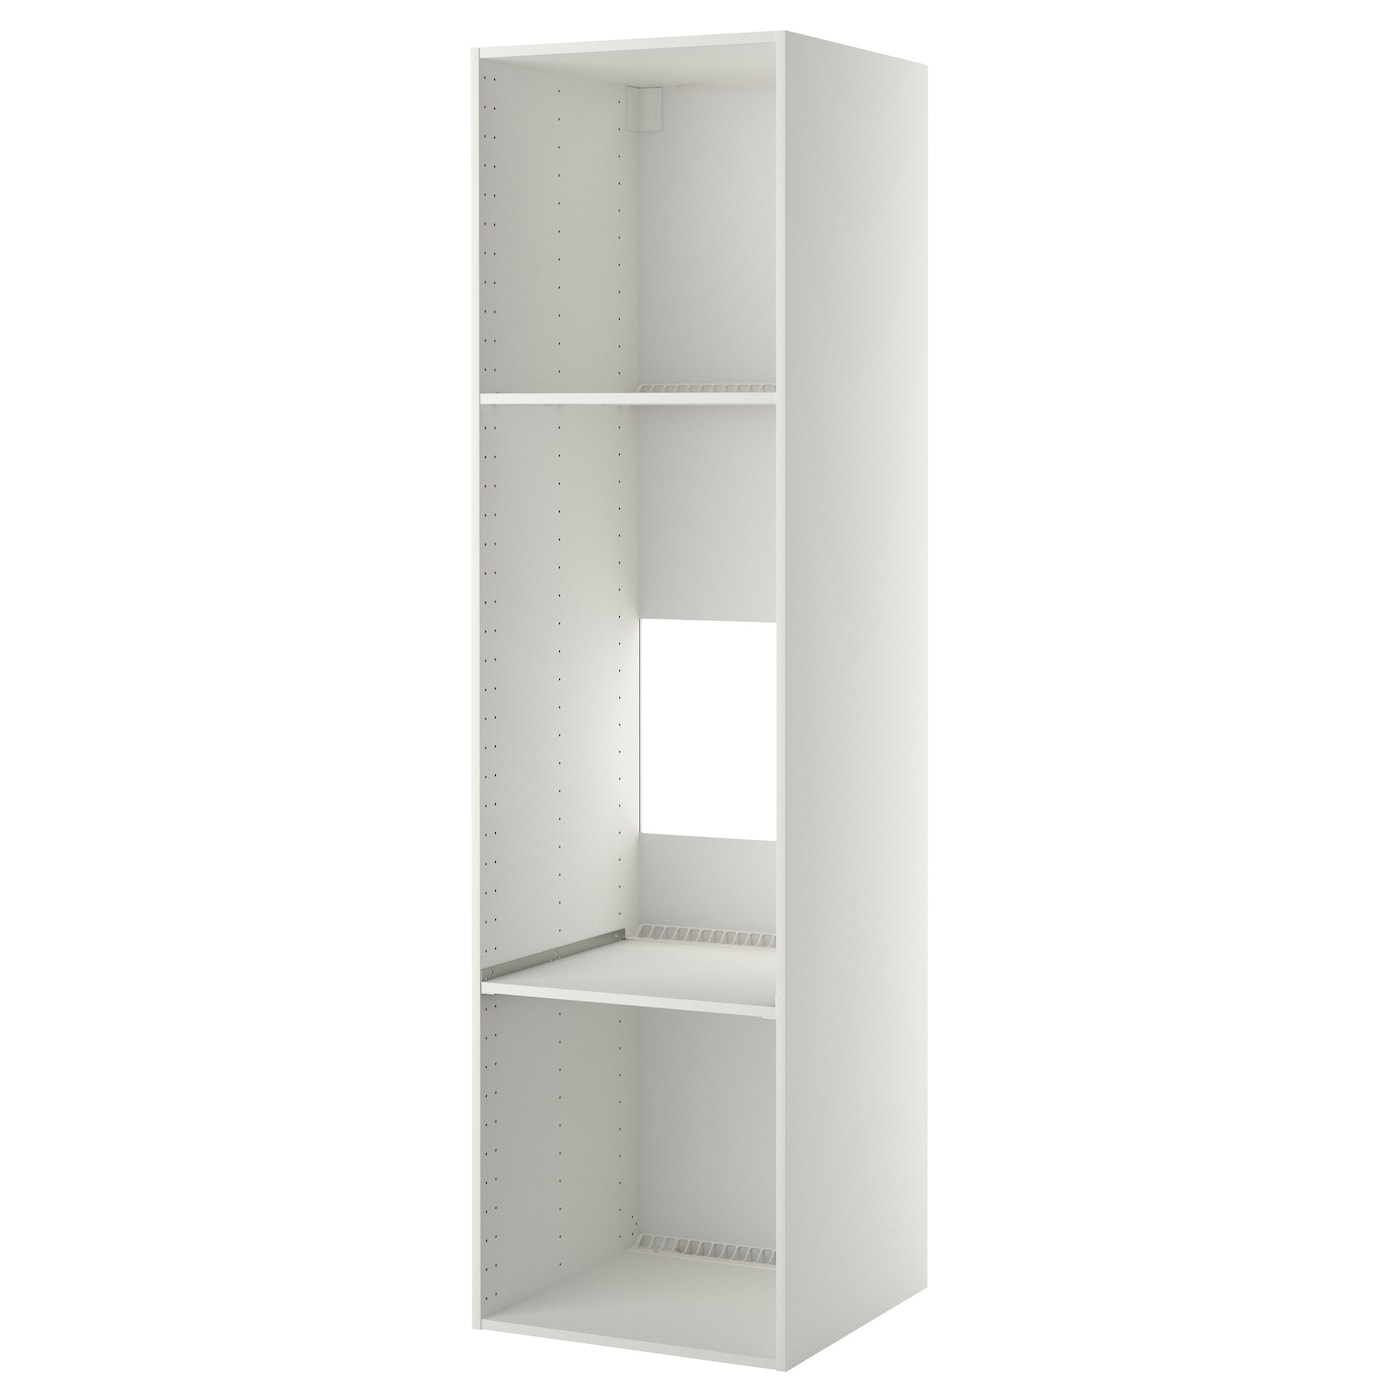 utrusta tablette fixe av grille d 39 a ration blanc 60 x 60. Black Bedroom Furniture Sets. Home Design Ideas